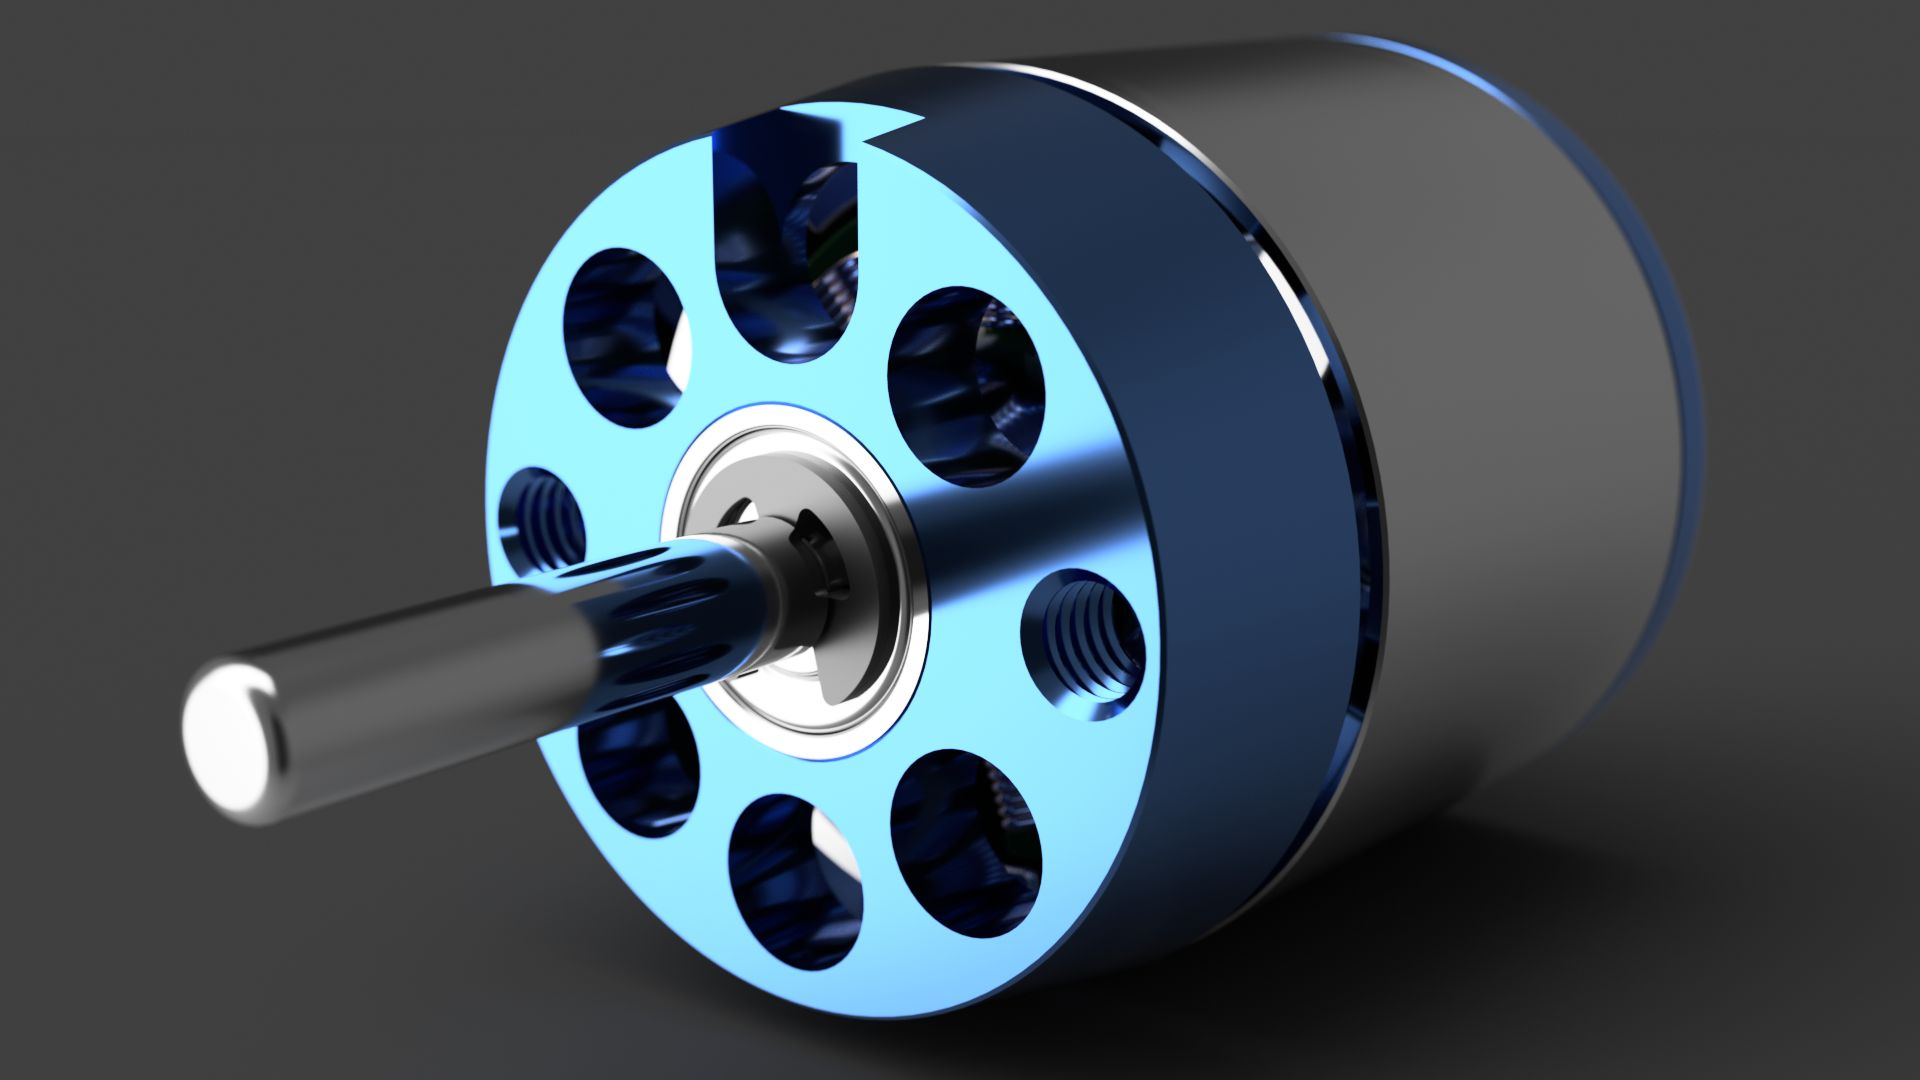 Brushless-motor-d2225-19-1350kv-2017-jun-29-10-06-26am-000-customizedview8788548644-3500-3500